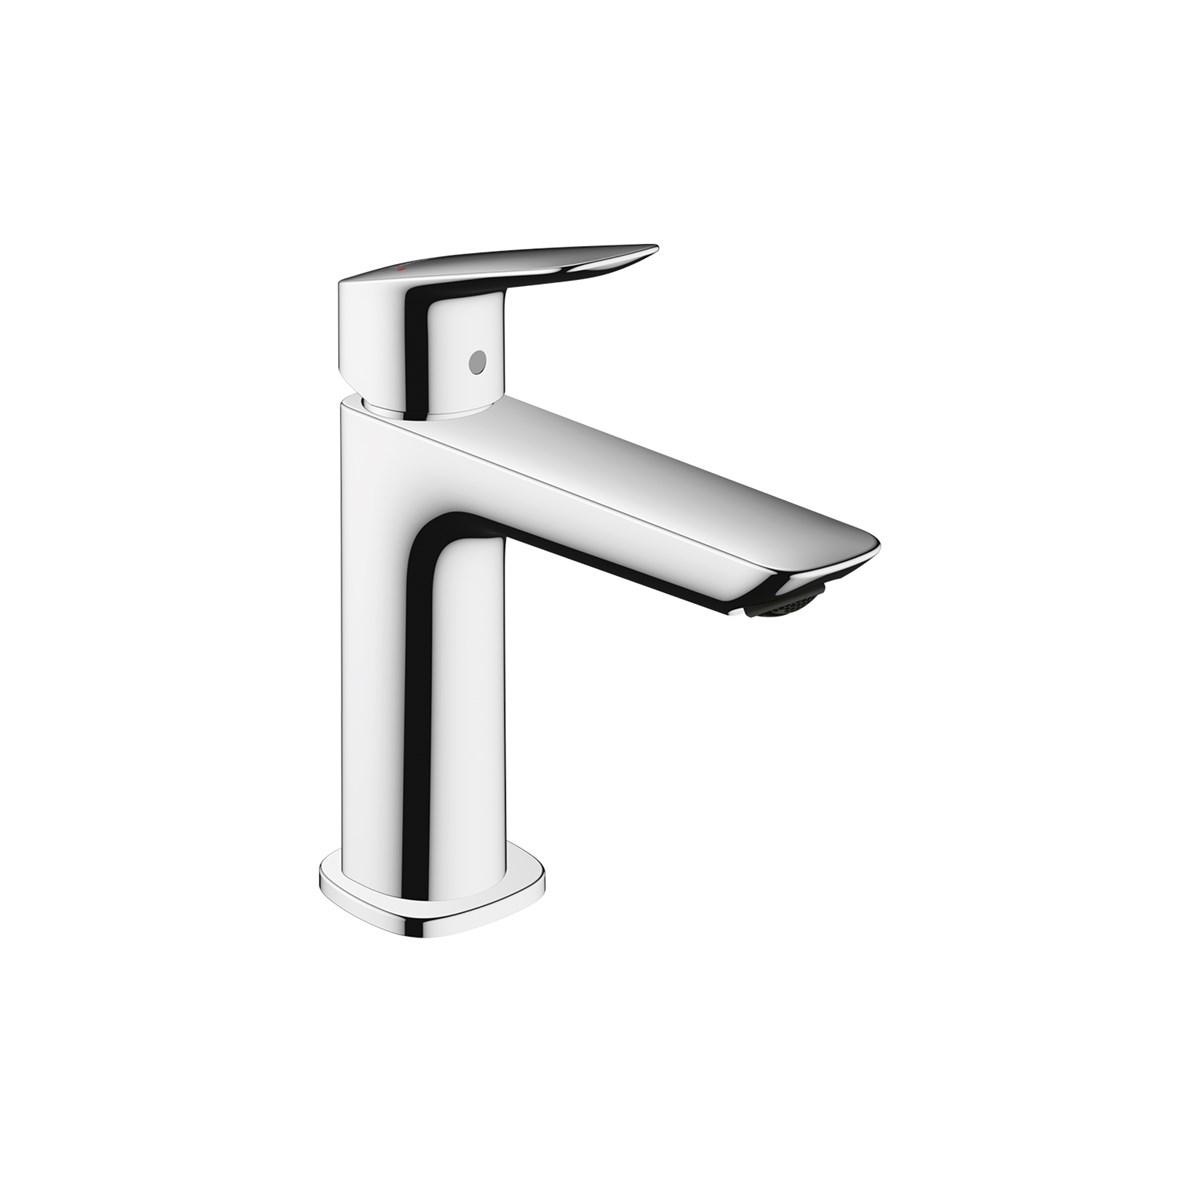 Hansgrohe-Logis-Fine-Basin-Mixer-110-CoolStart-71255000-Matisse-1